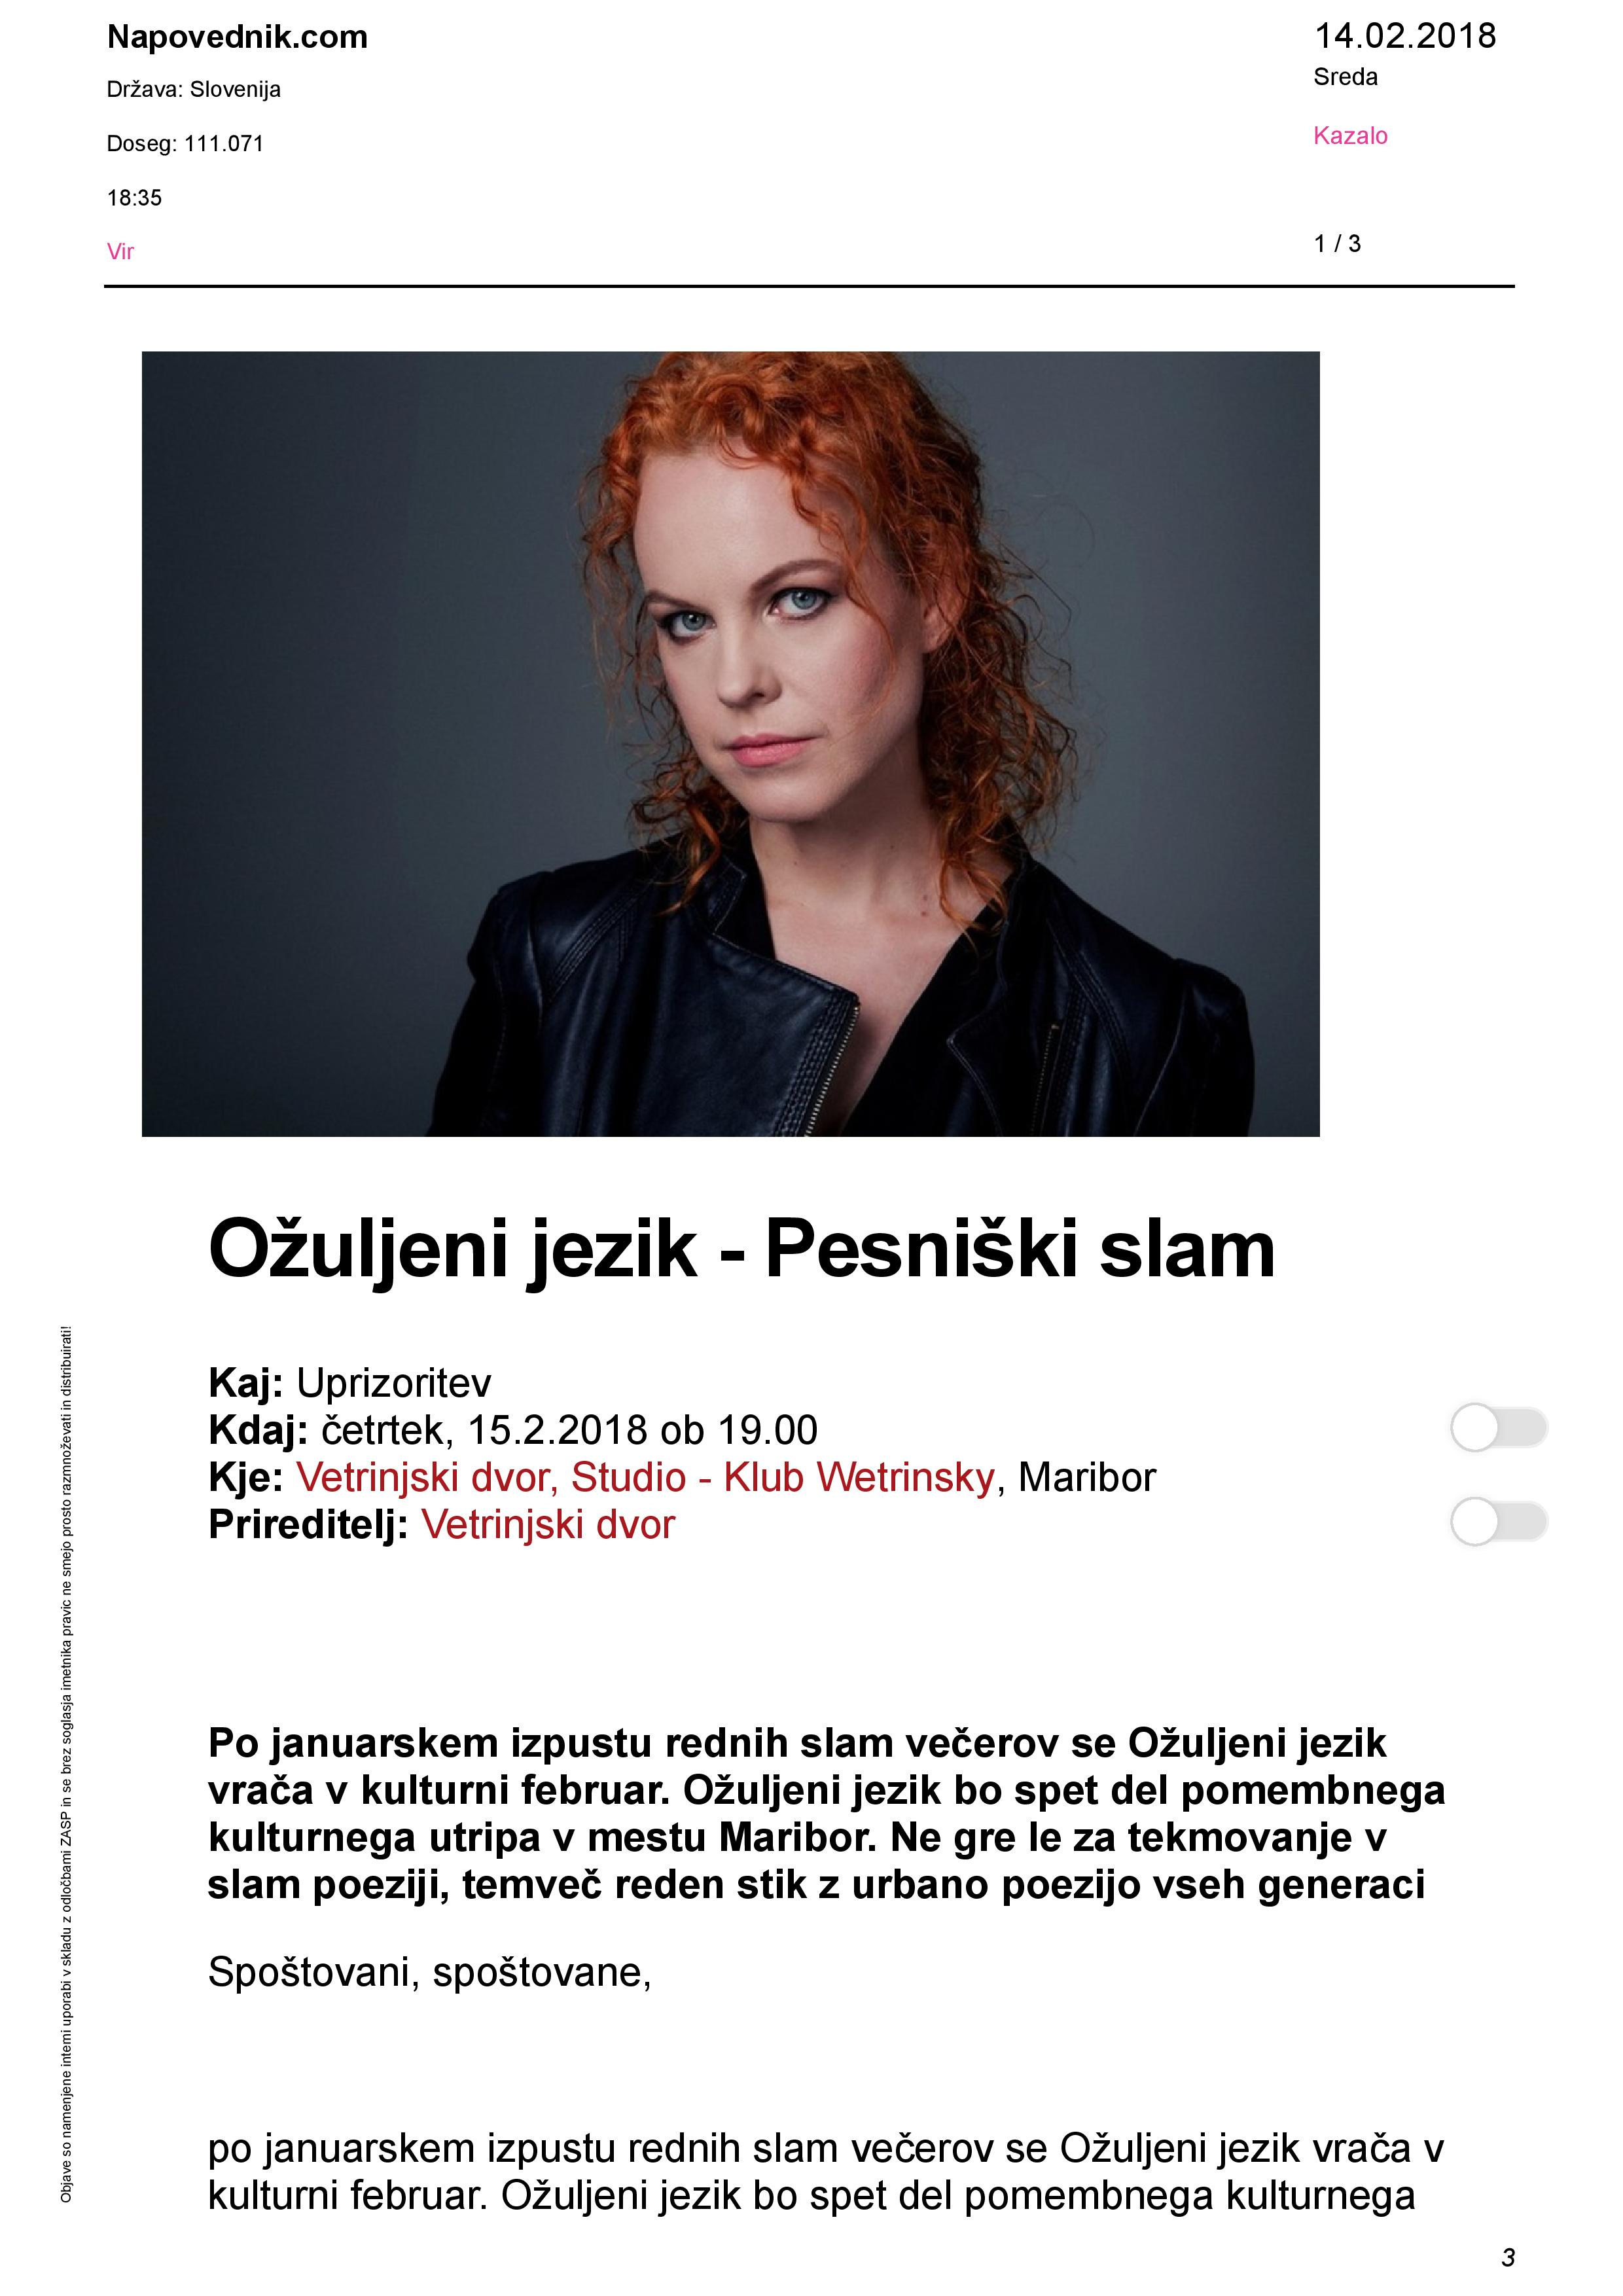 14/2 Napovednik.com